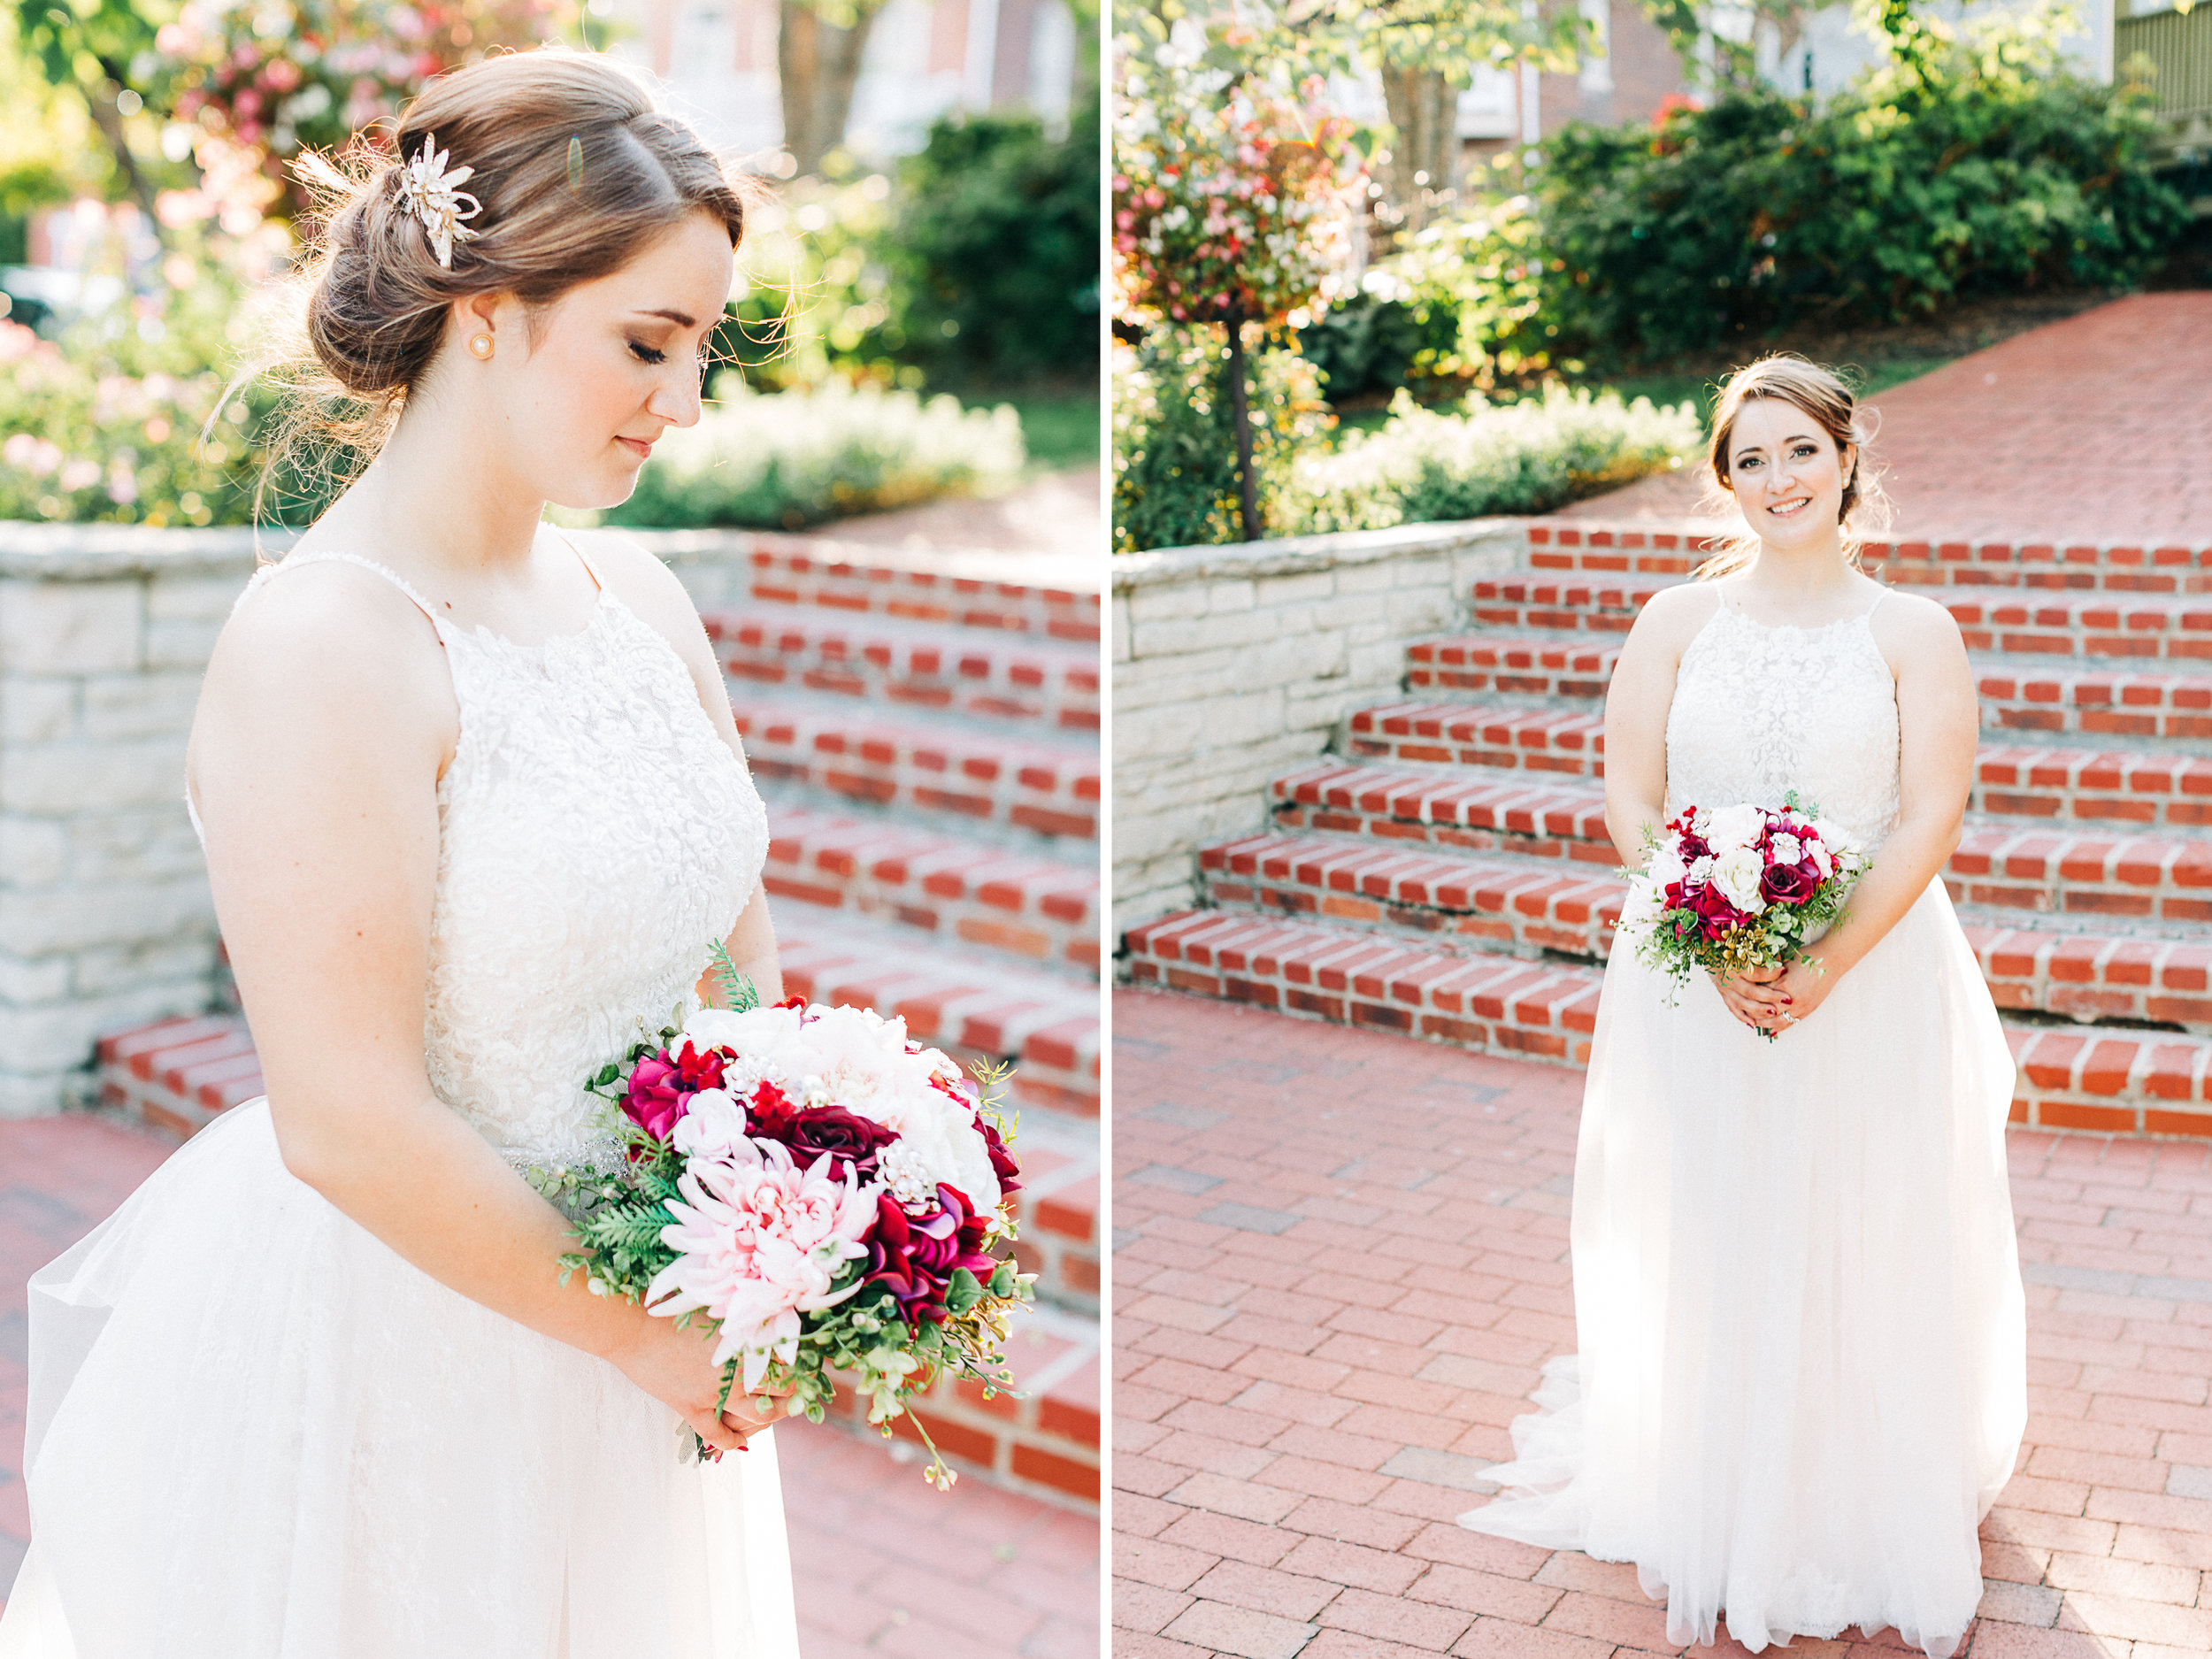 Dorothy_Louise_Photography_Eric_Fallon_La-Belle_Coeur_Main_Street_St_Charles_Wedding_Collage6.jpg